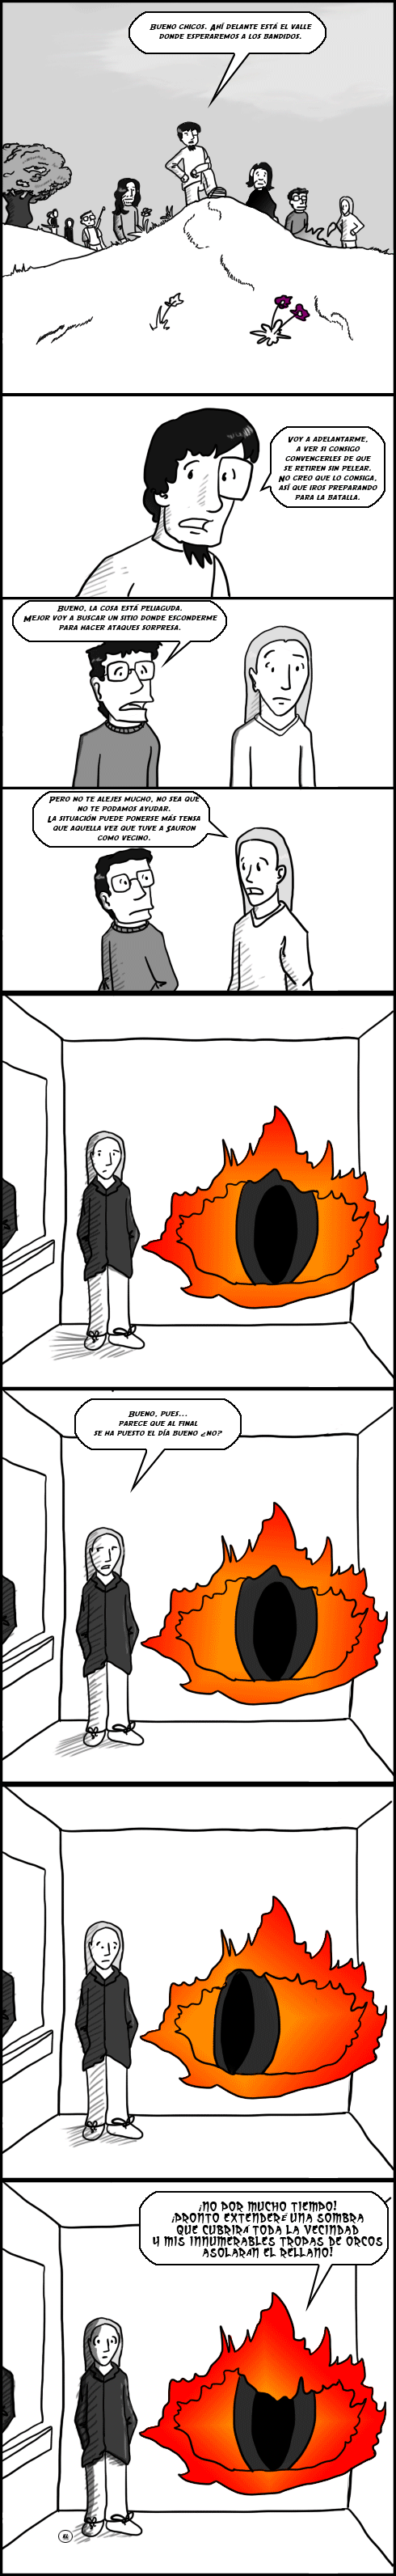 Tira0489